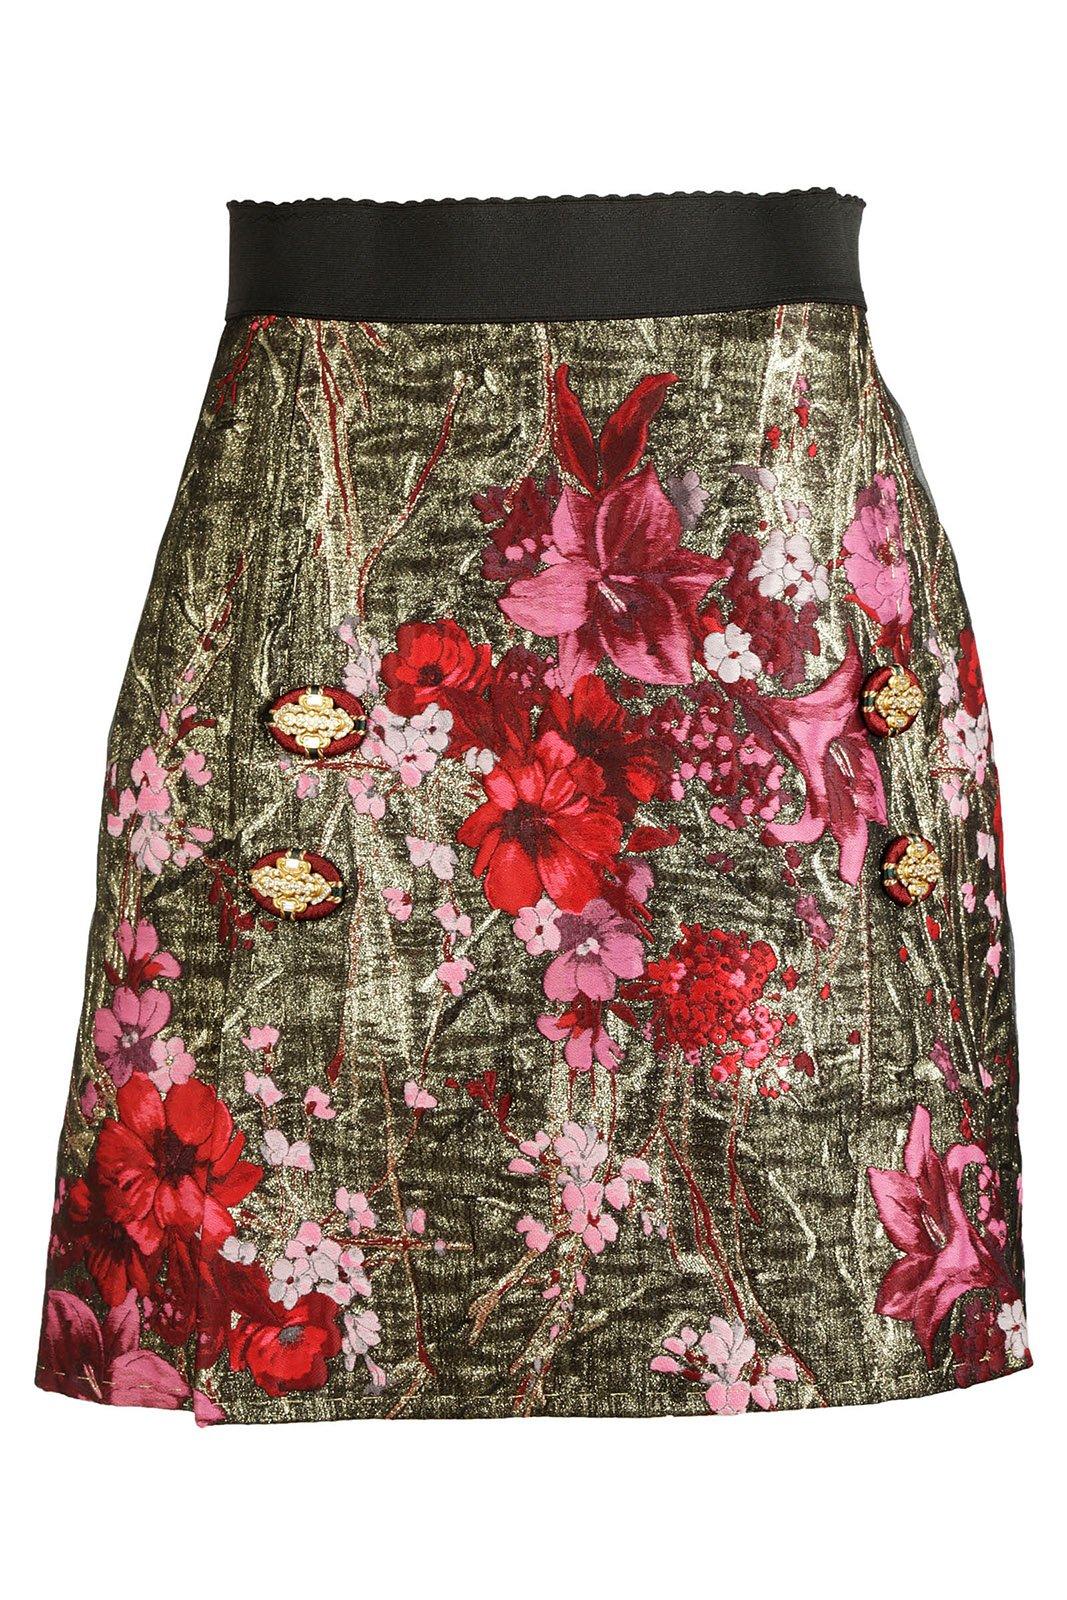 Dolce&Gabbana Women's Skirt Mini Short Jacquard Gold US Size 44 (US 32) F4AZNZFJM2ES8350